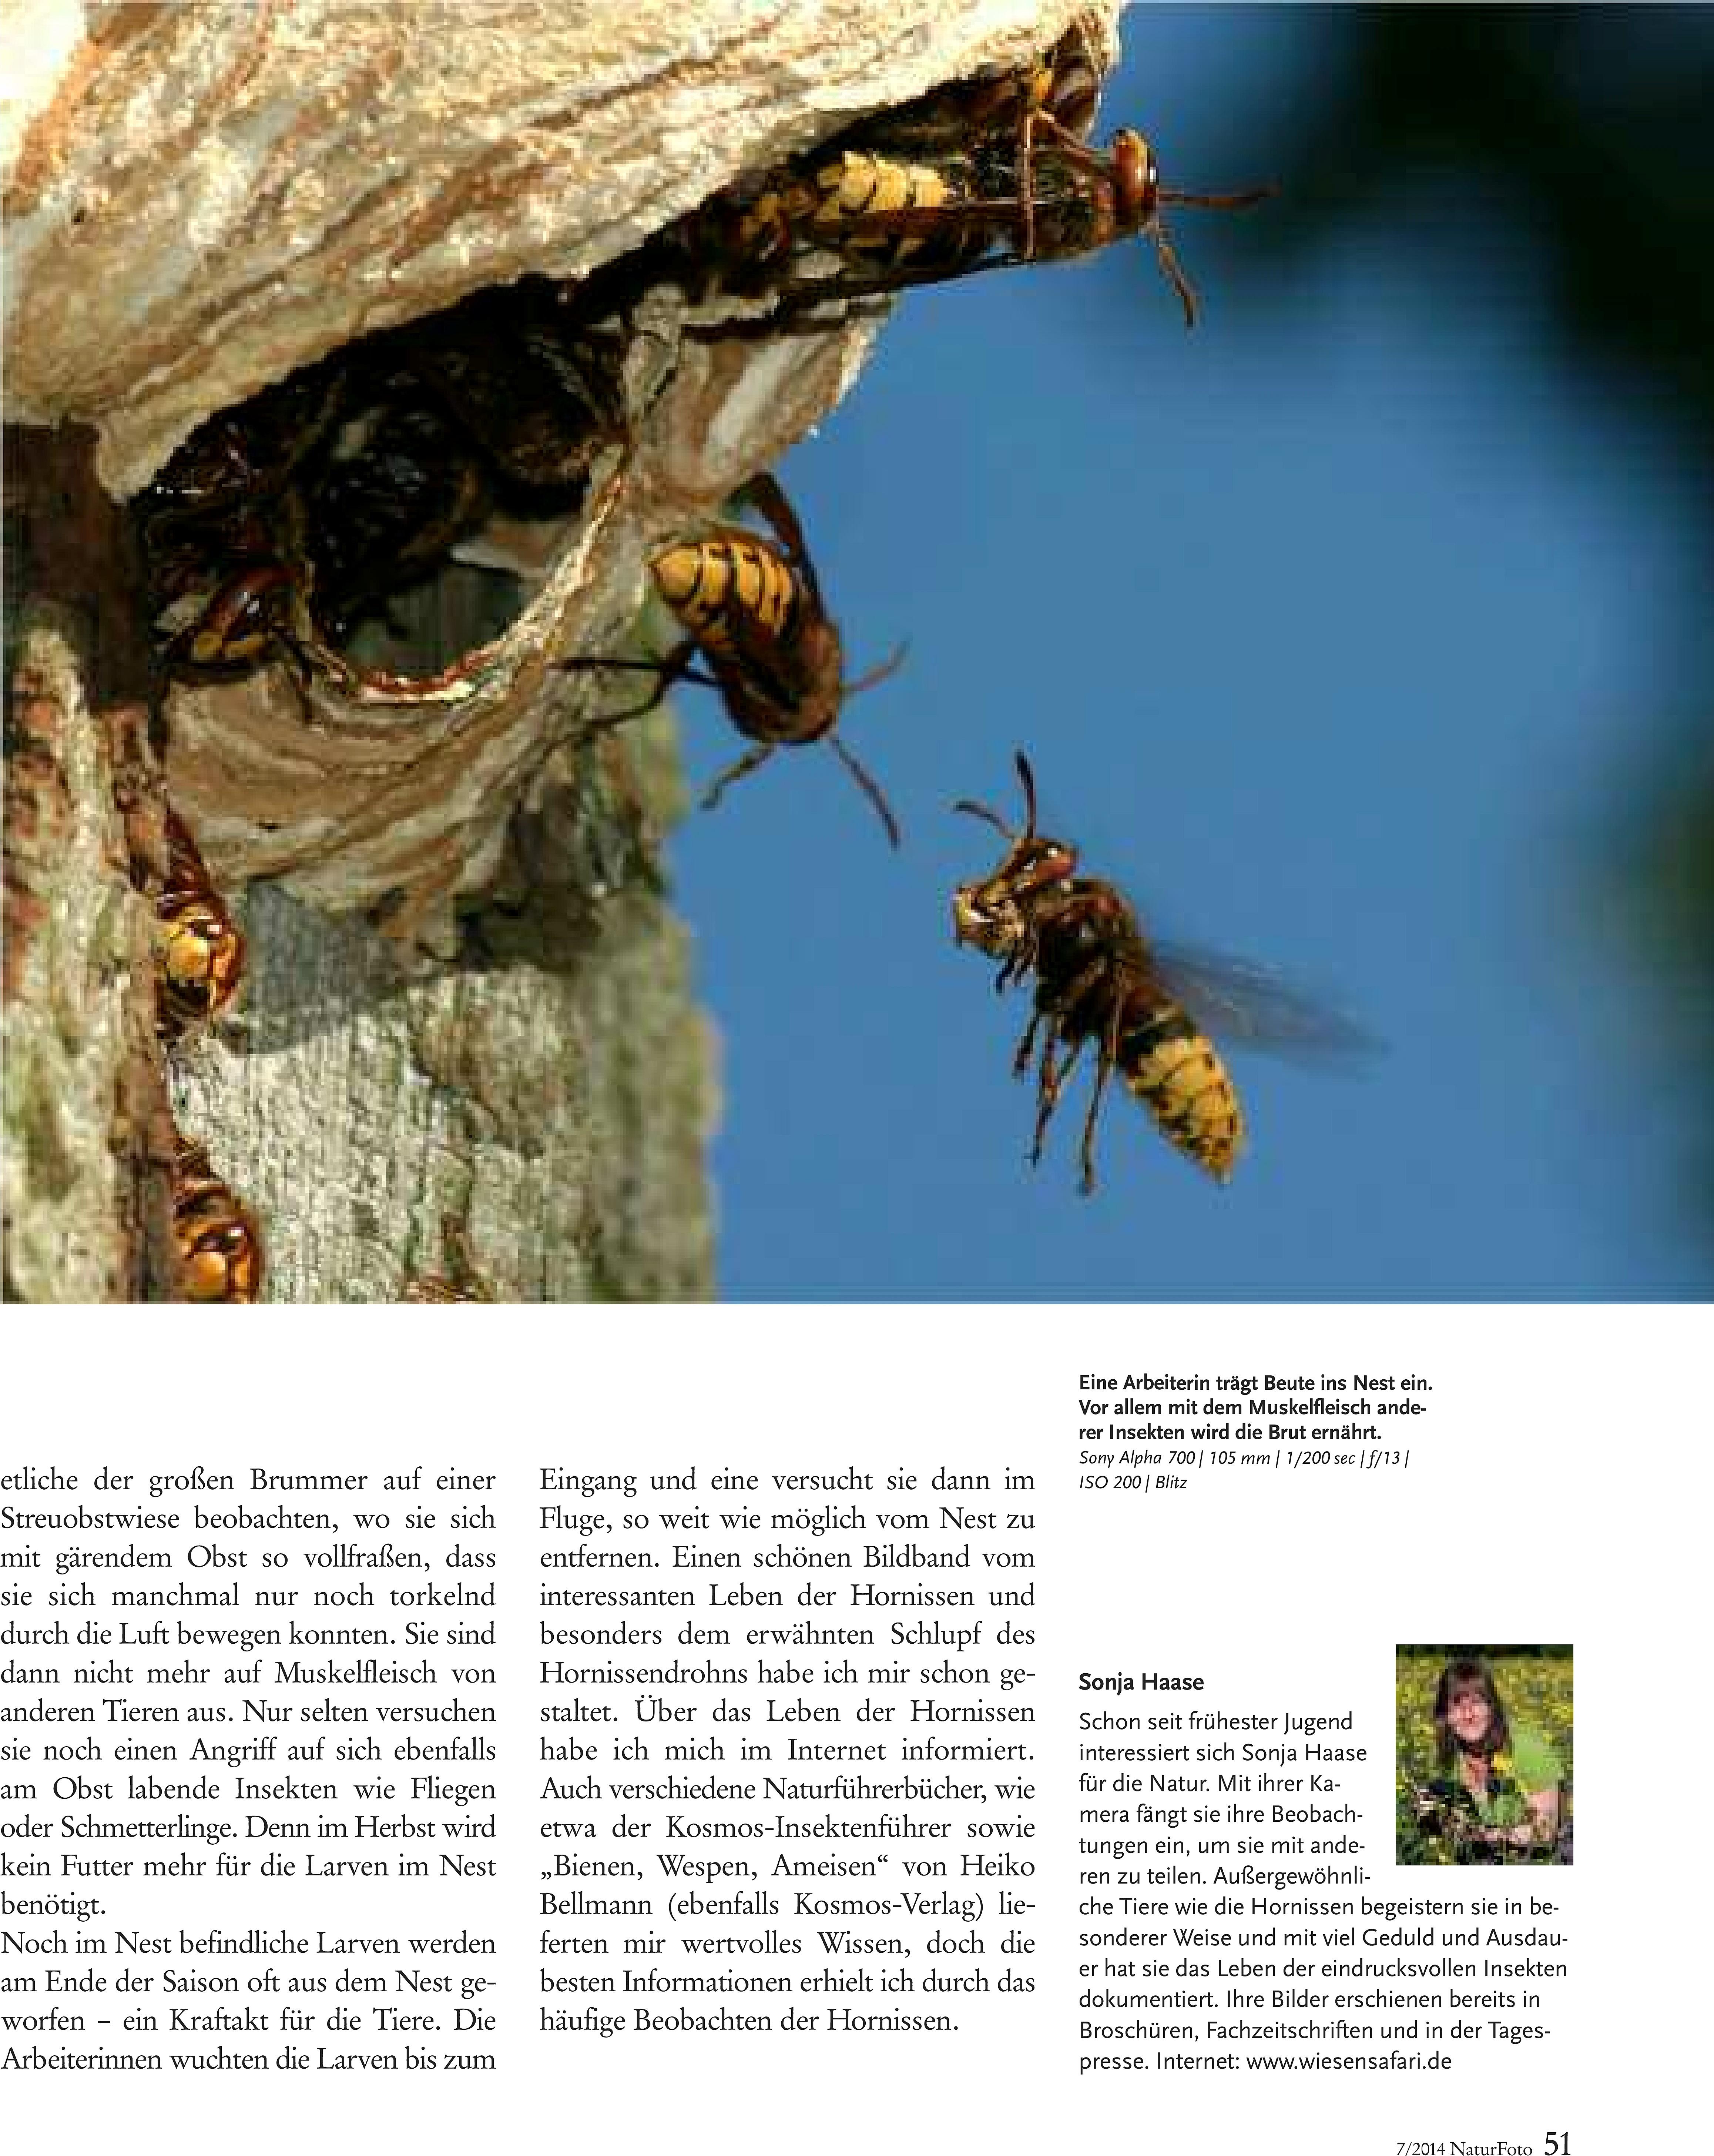 46-51 Haase Hornissen(2) Zeitschrift Natur-5